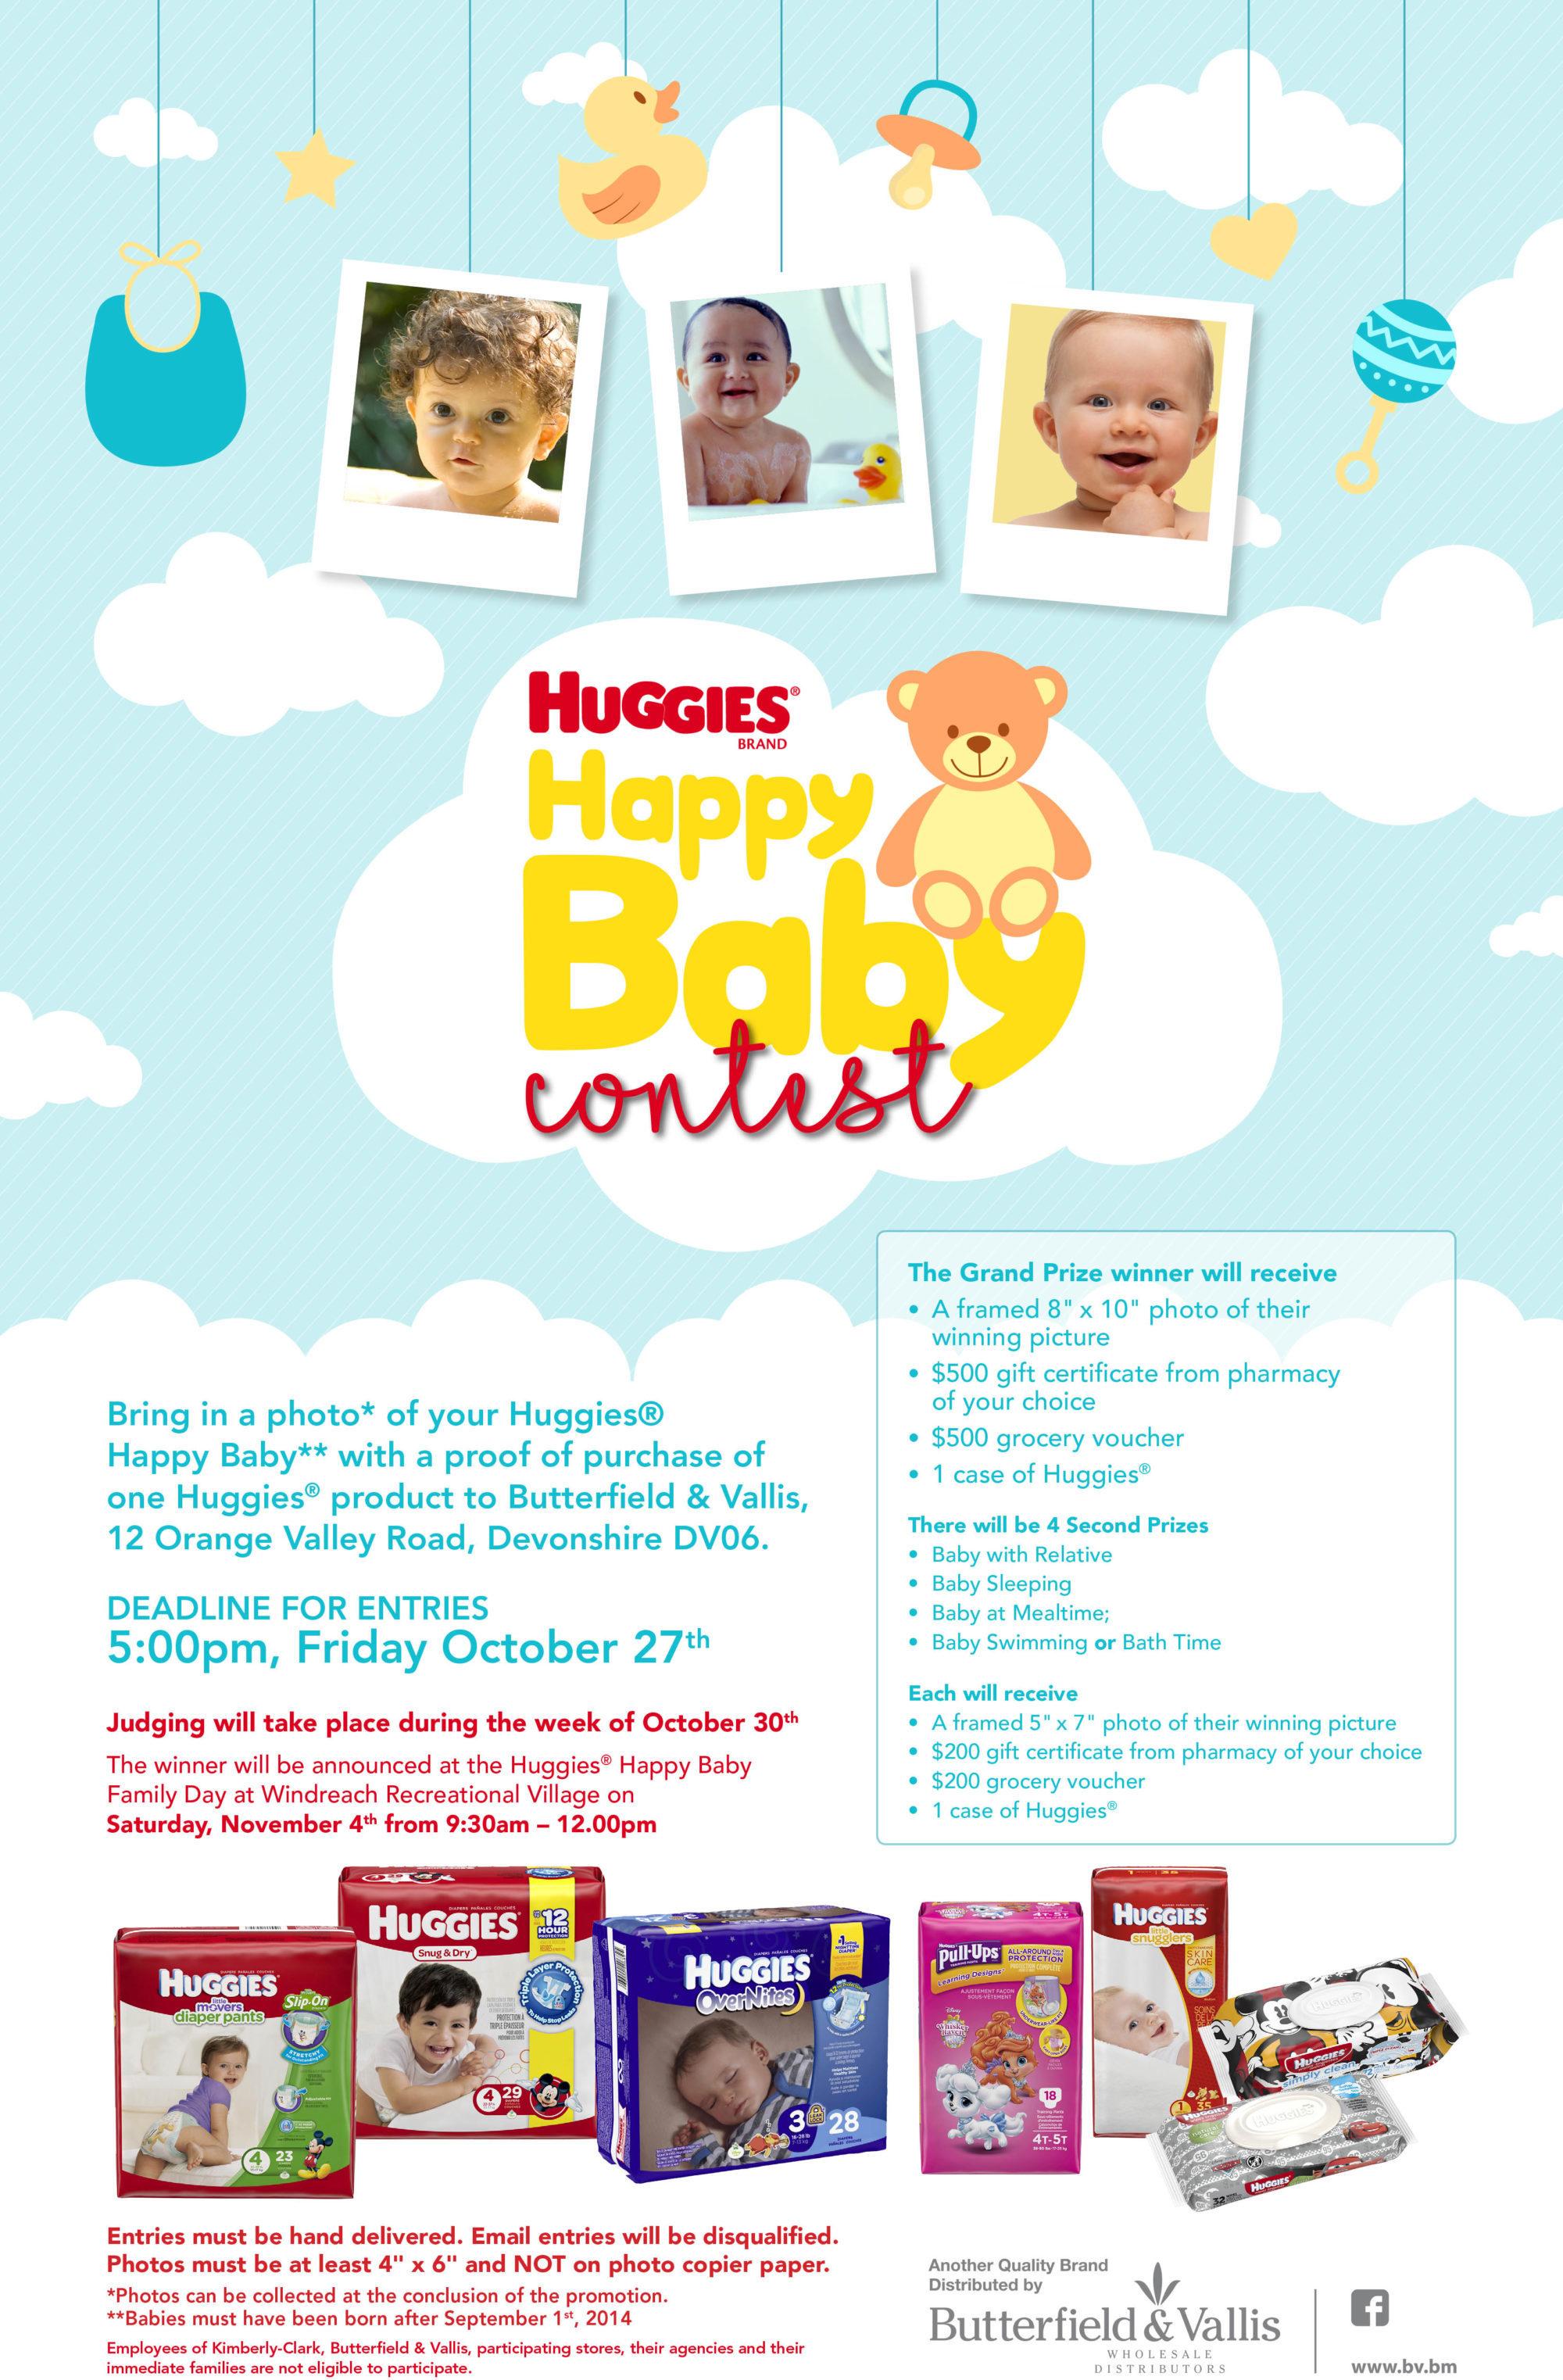 HUGGIES HAPPY BABY CONTEST